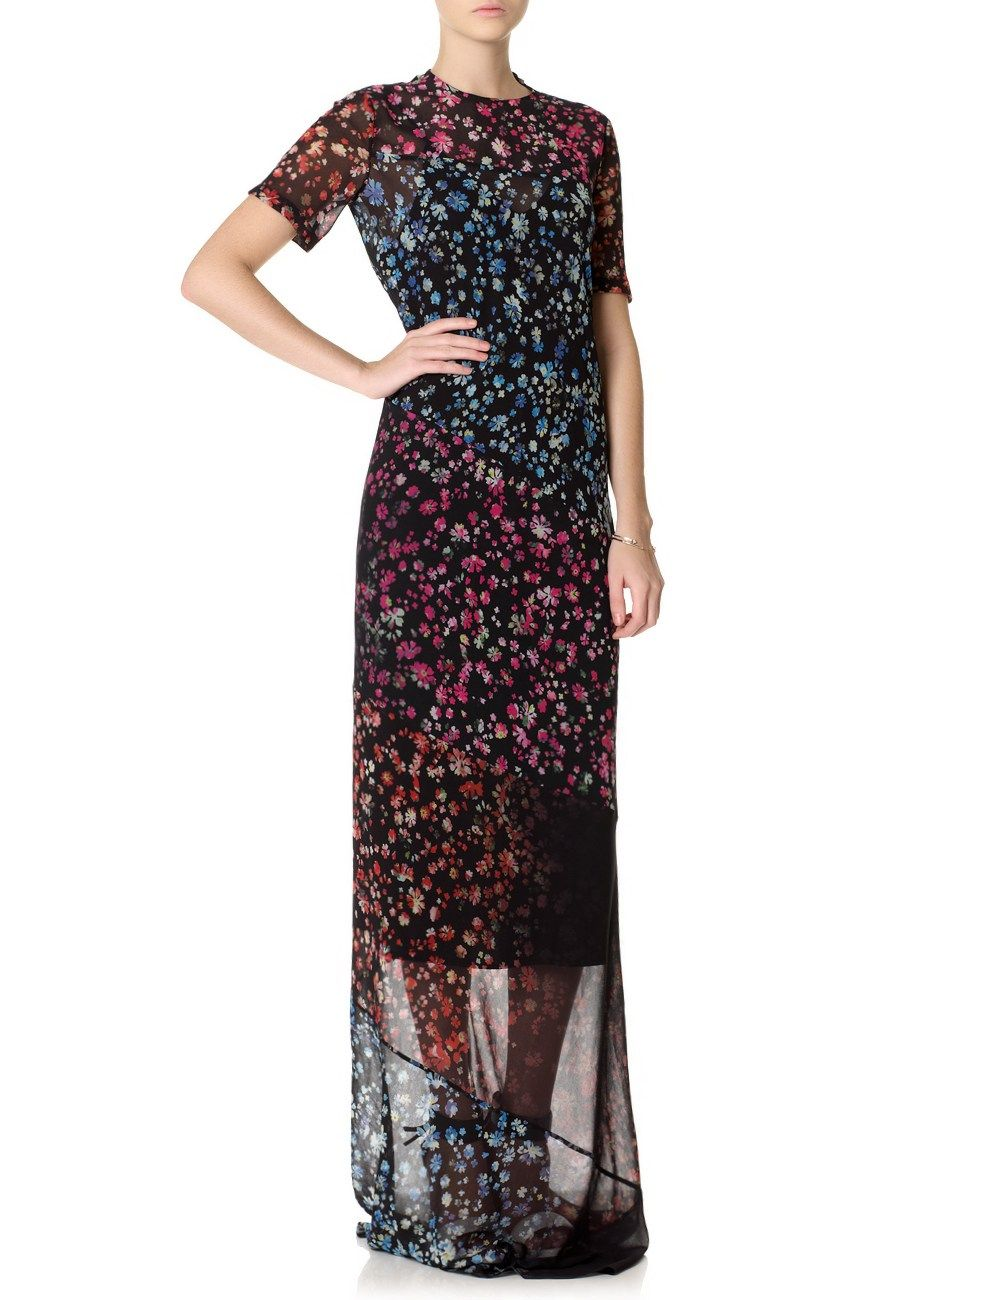 Black Georgette Floral Elli Dress | Preen by Thornton Bregazzi | Avenue32